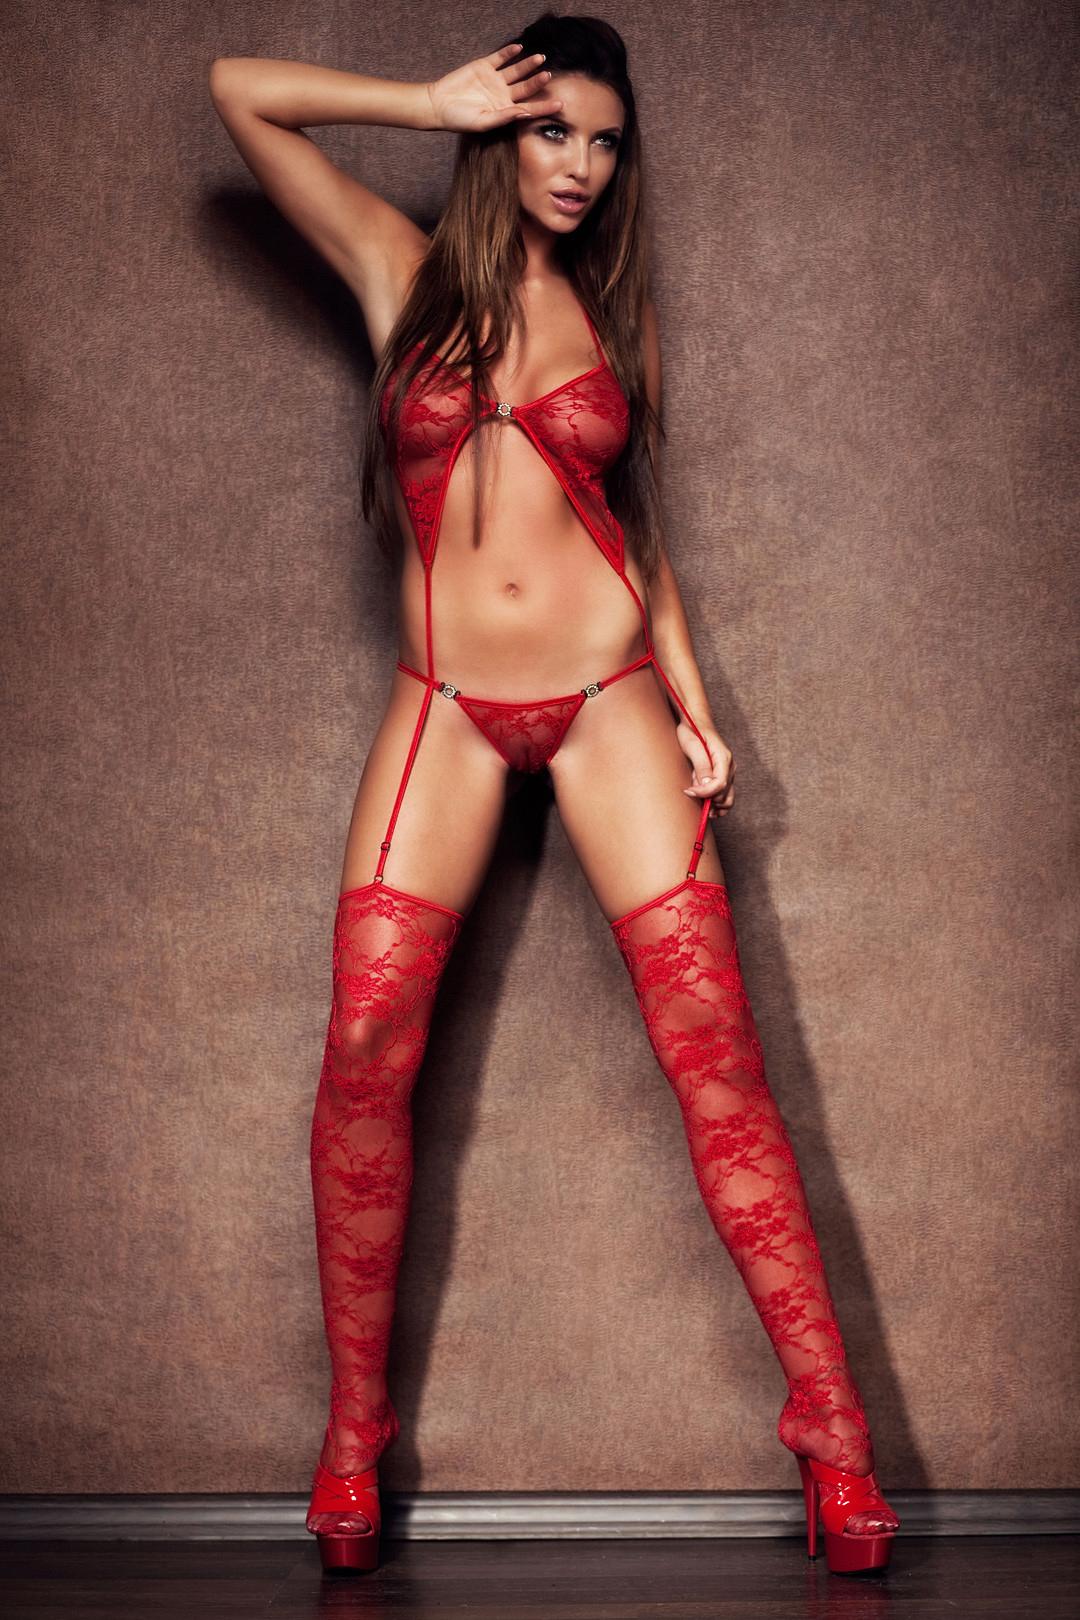 hot women wearing see through red lingerie - Monika Pietrasinska